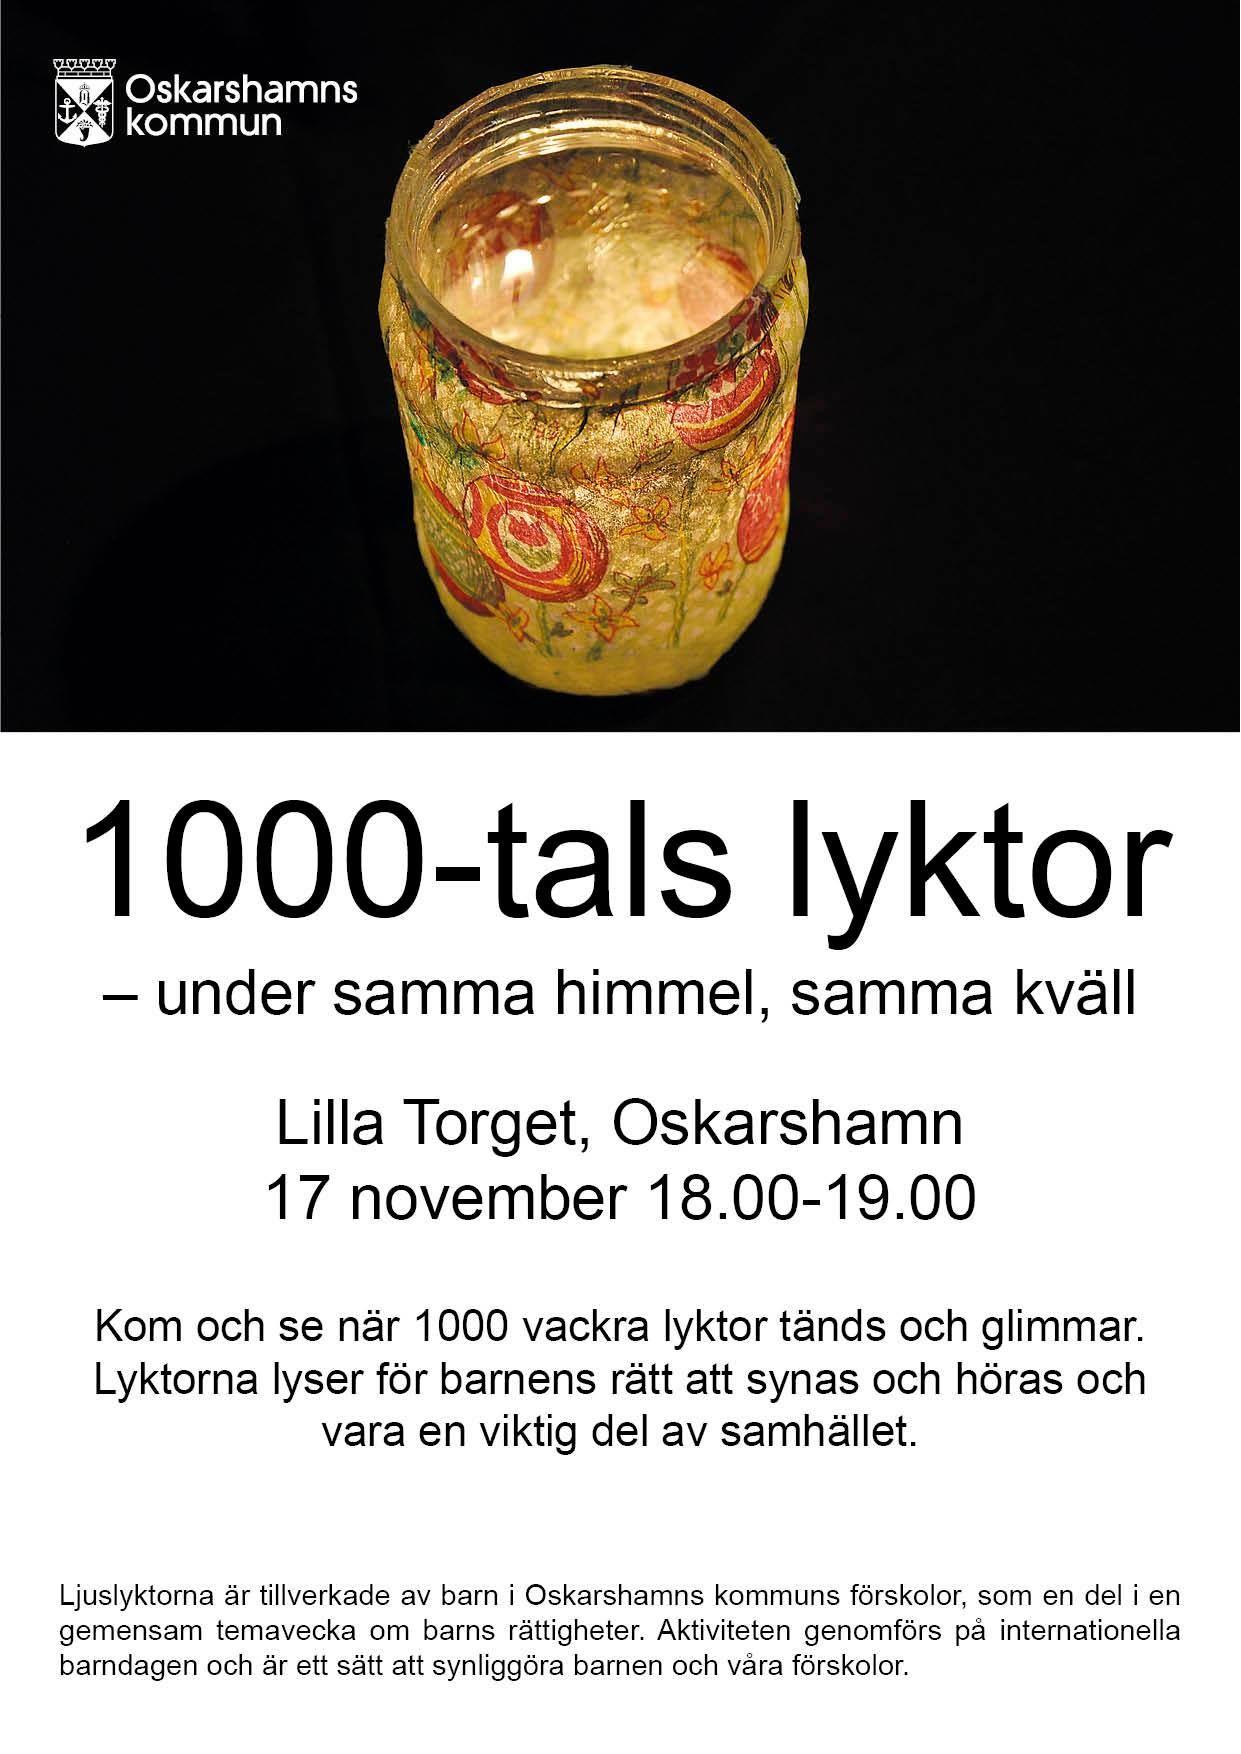 1000-tals lyktor